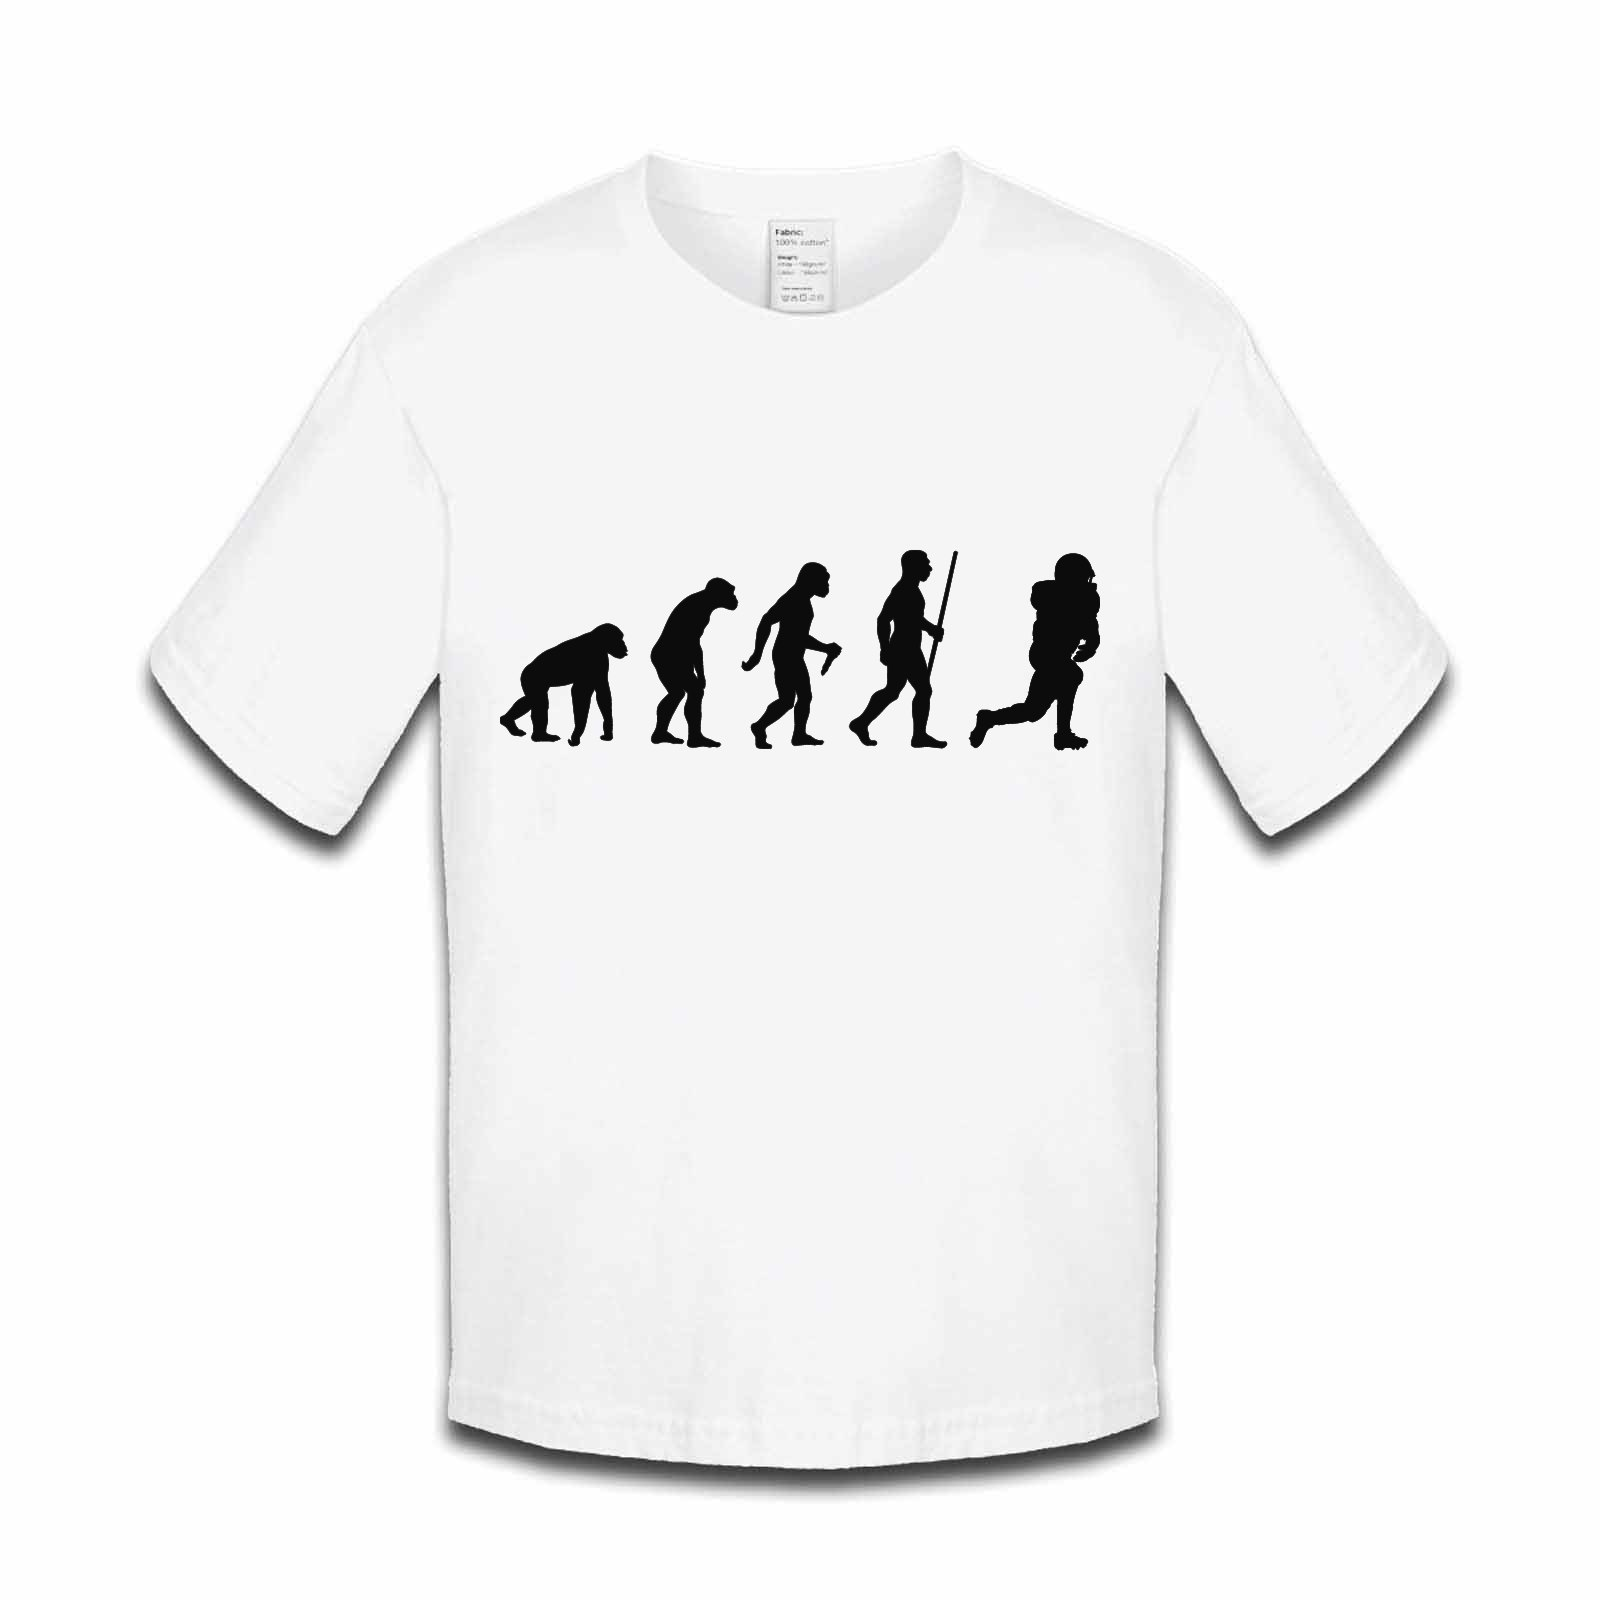 Ladies American Football T Shirt - BCD Tofu House d16d2898c